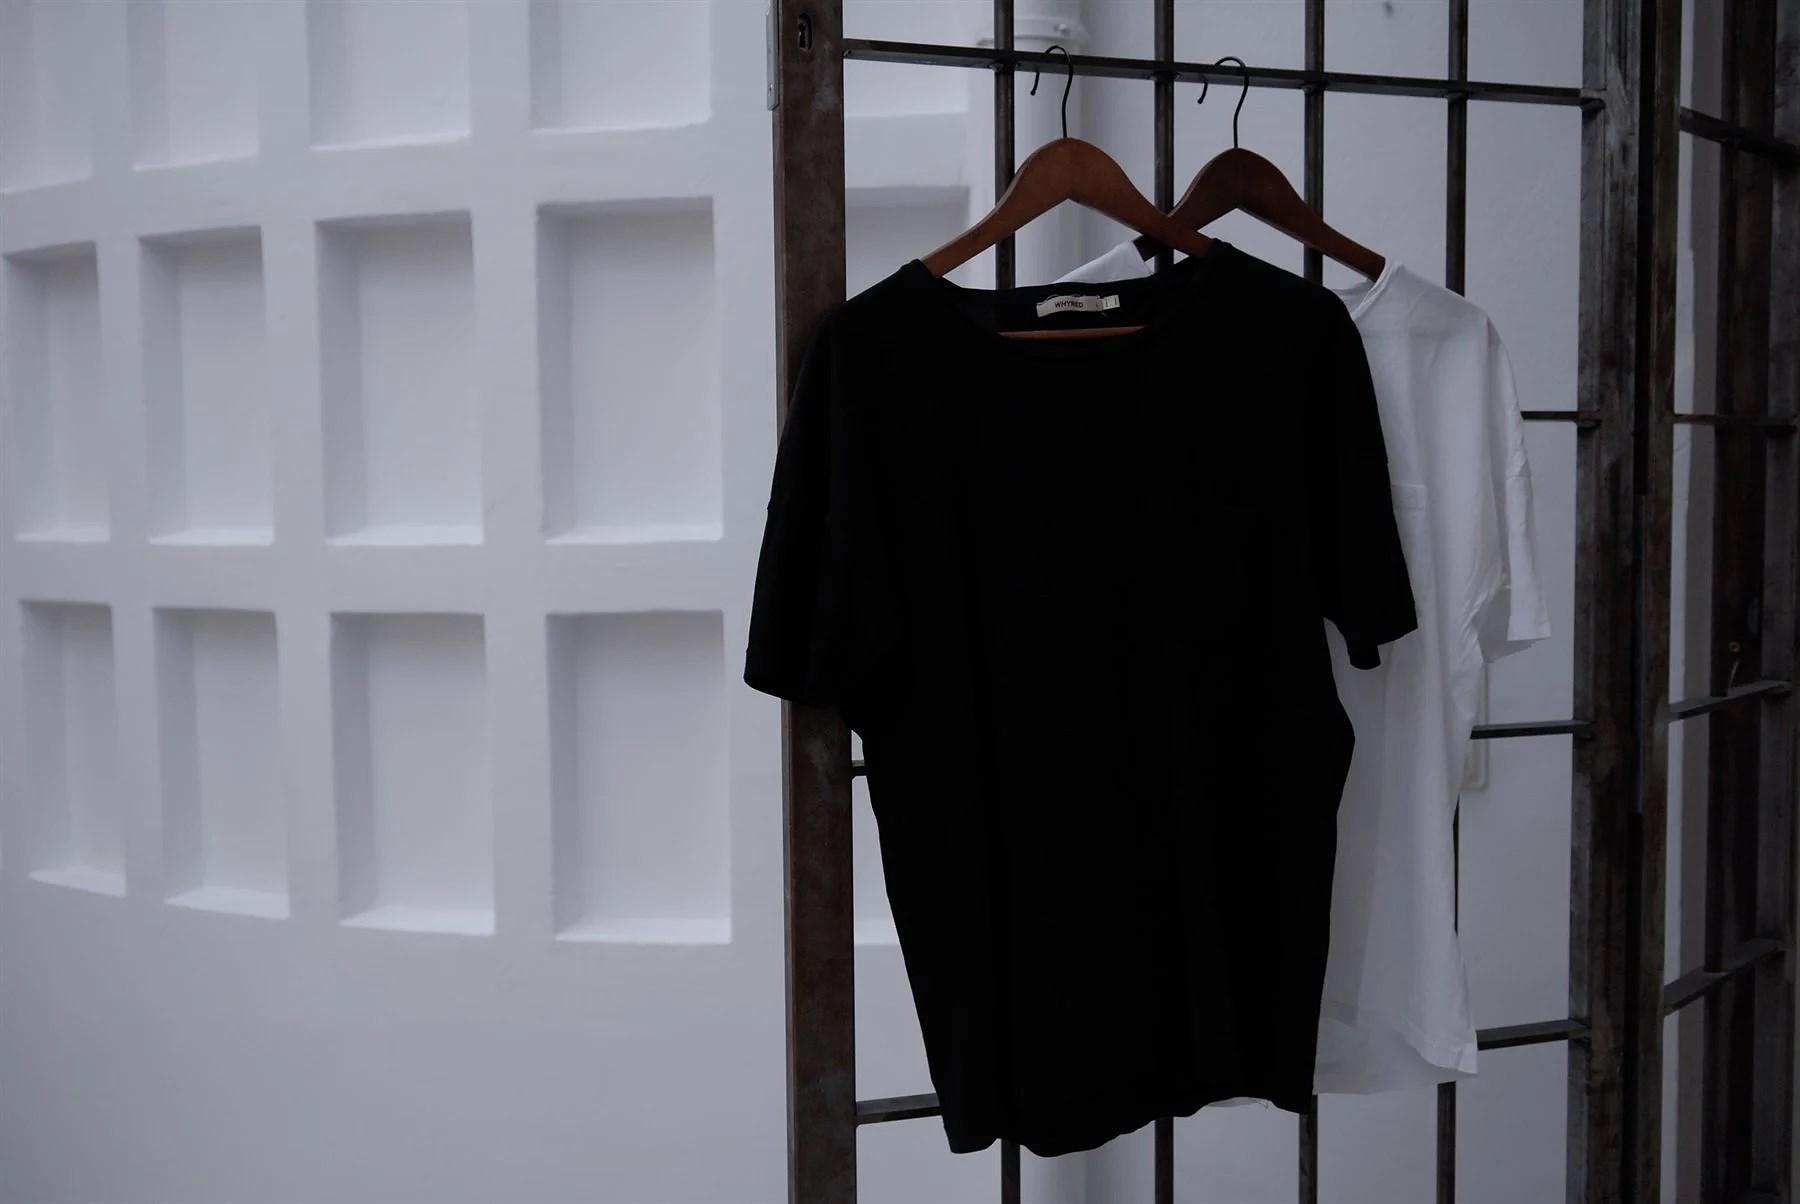 Basgarderoben - T-shirt